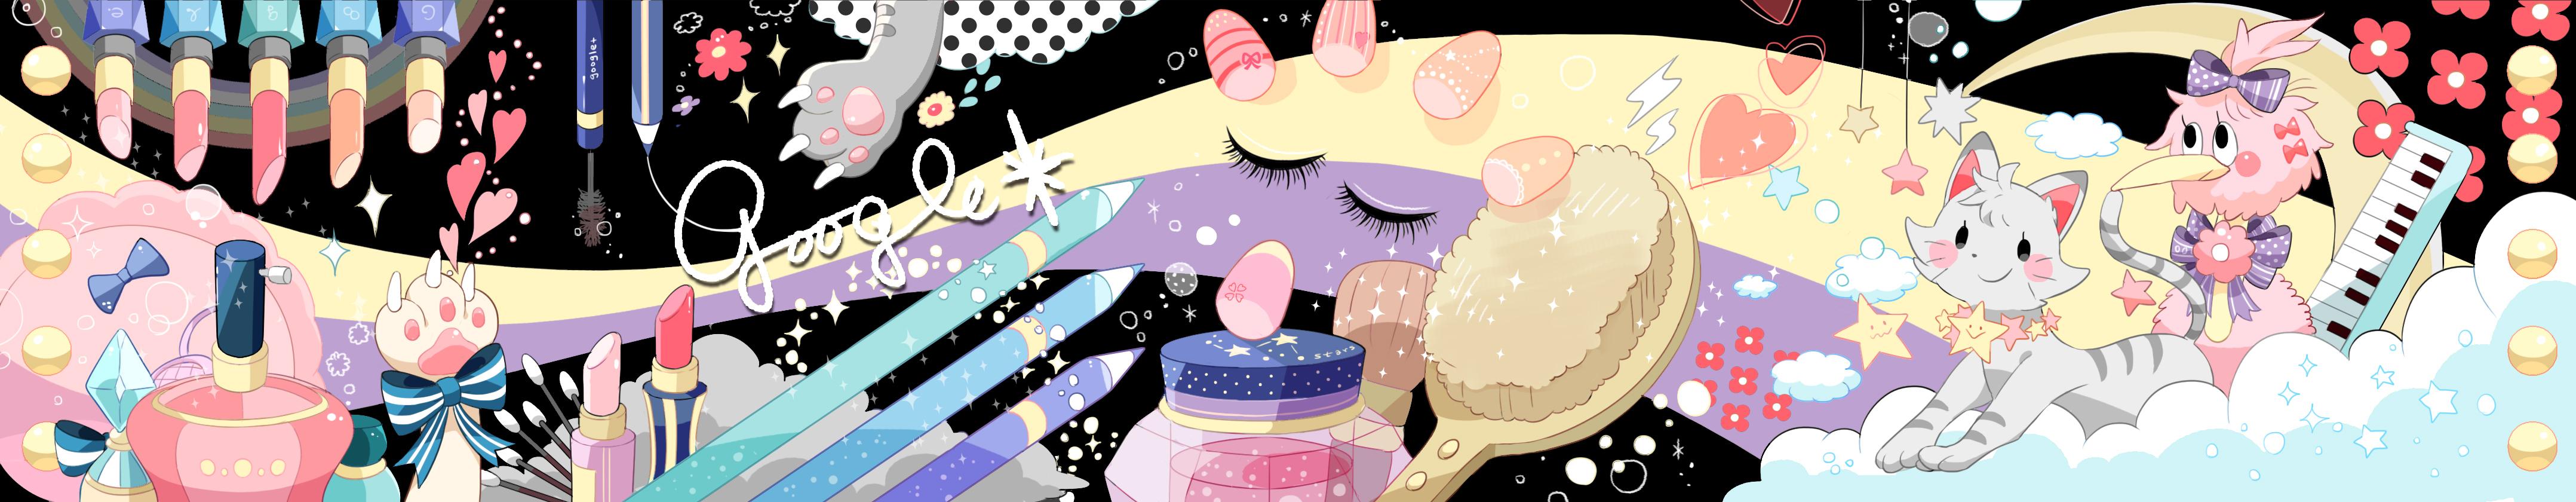 cosmetic+ by chamooi